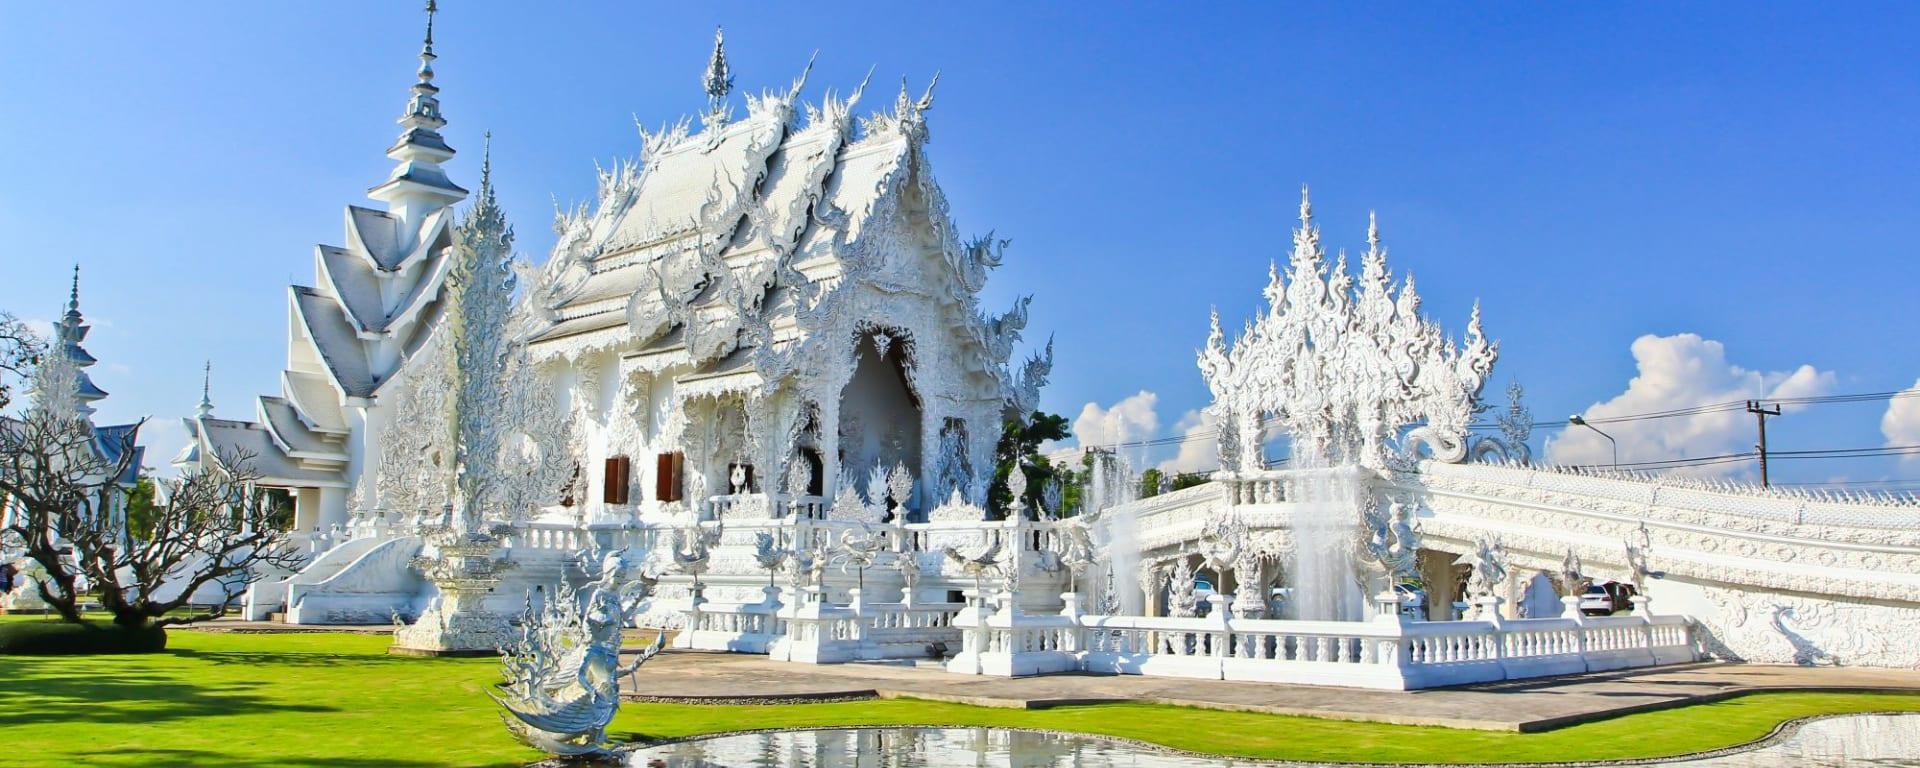 Thaïlande compacte de Bangkok: Chiang Rai Wat Rong Khun